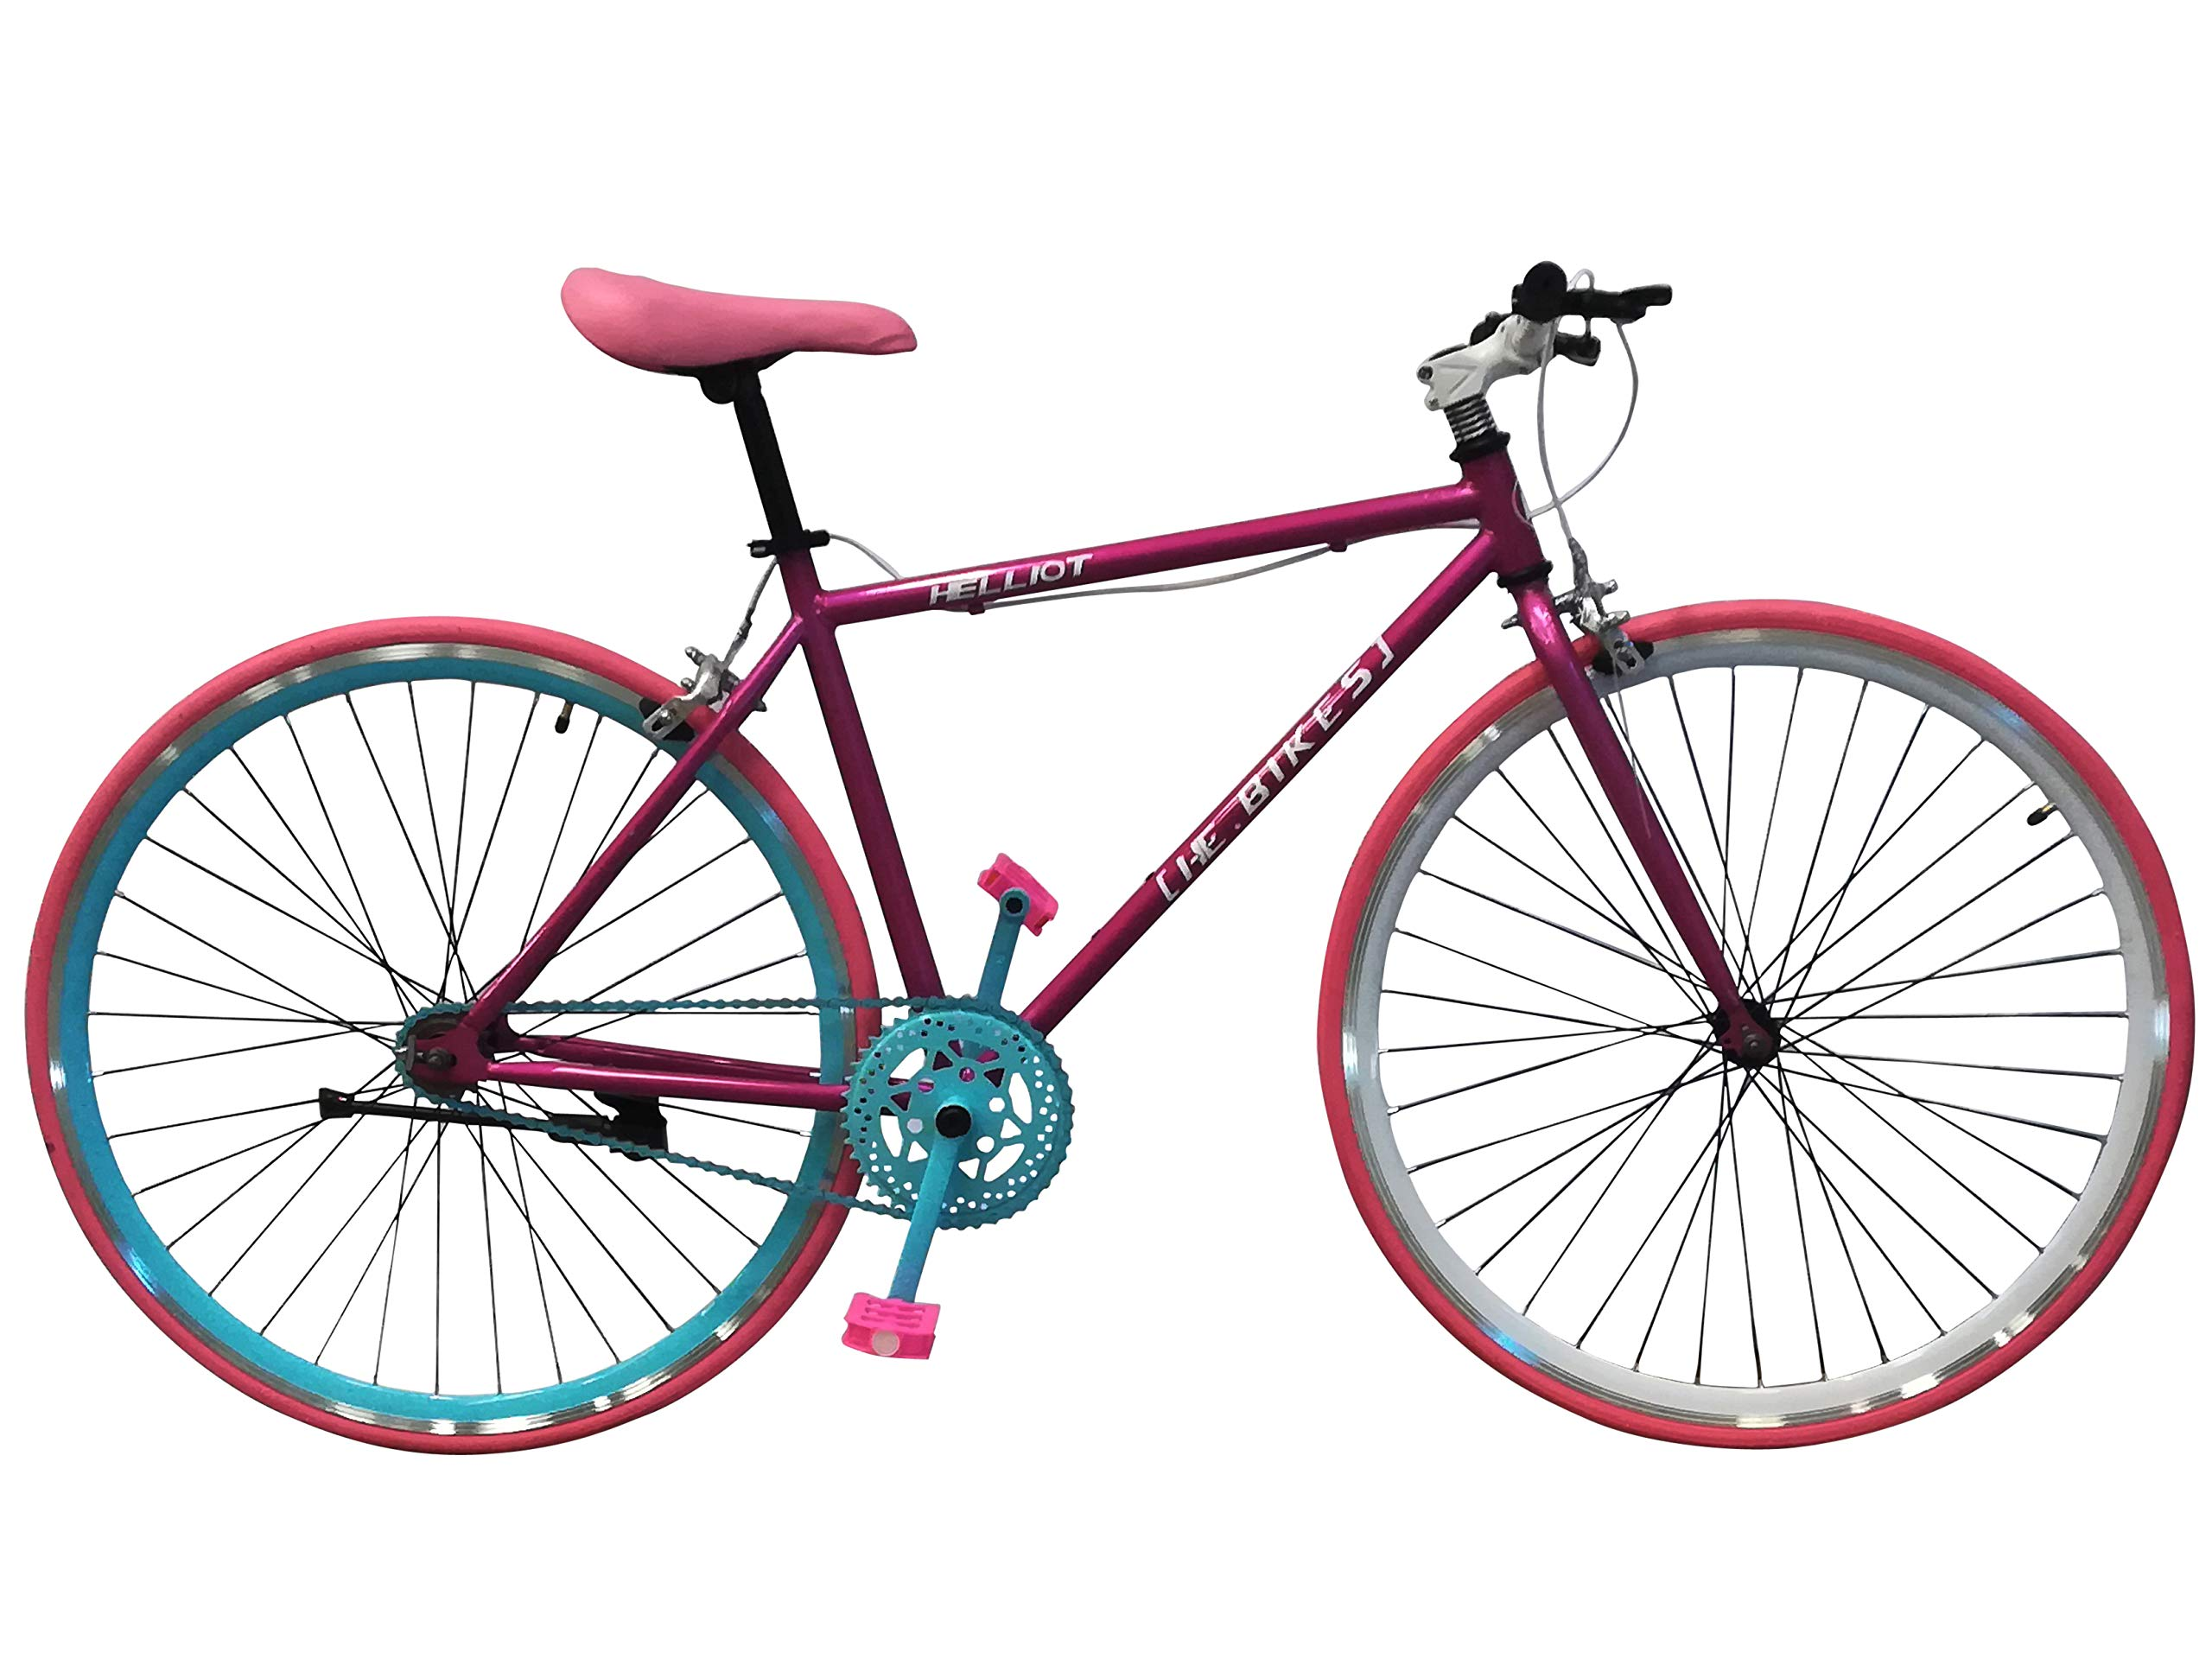 Helliot Bikes Soho 06 Bicicleta Fixie Urbana, Unisex Adulto, Rosa ...